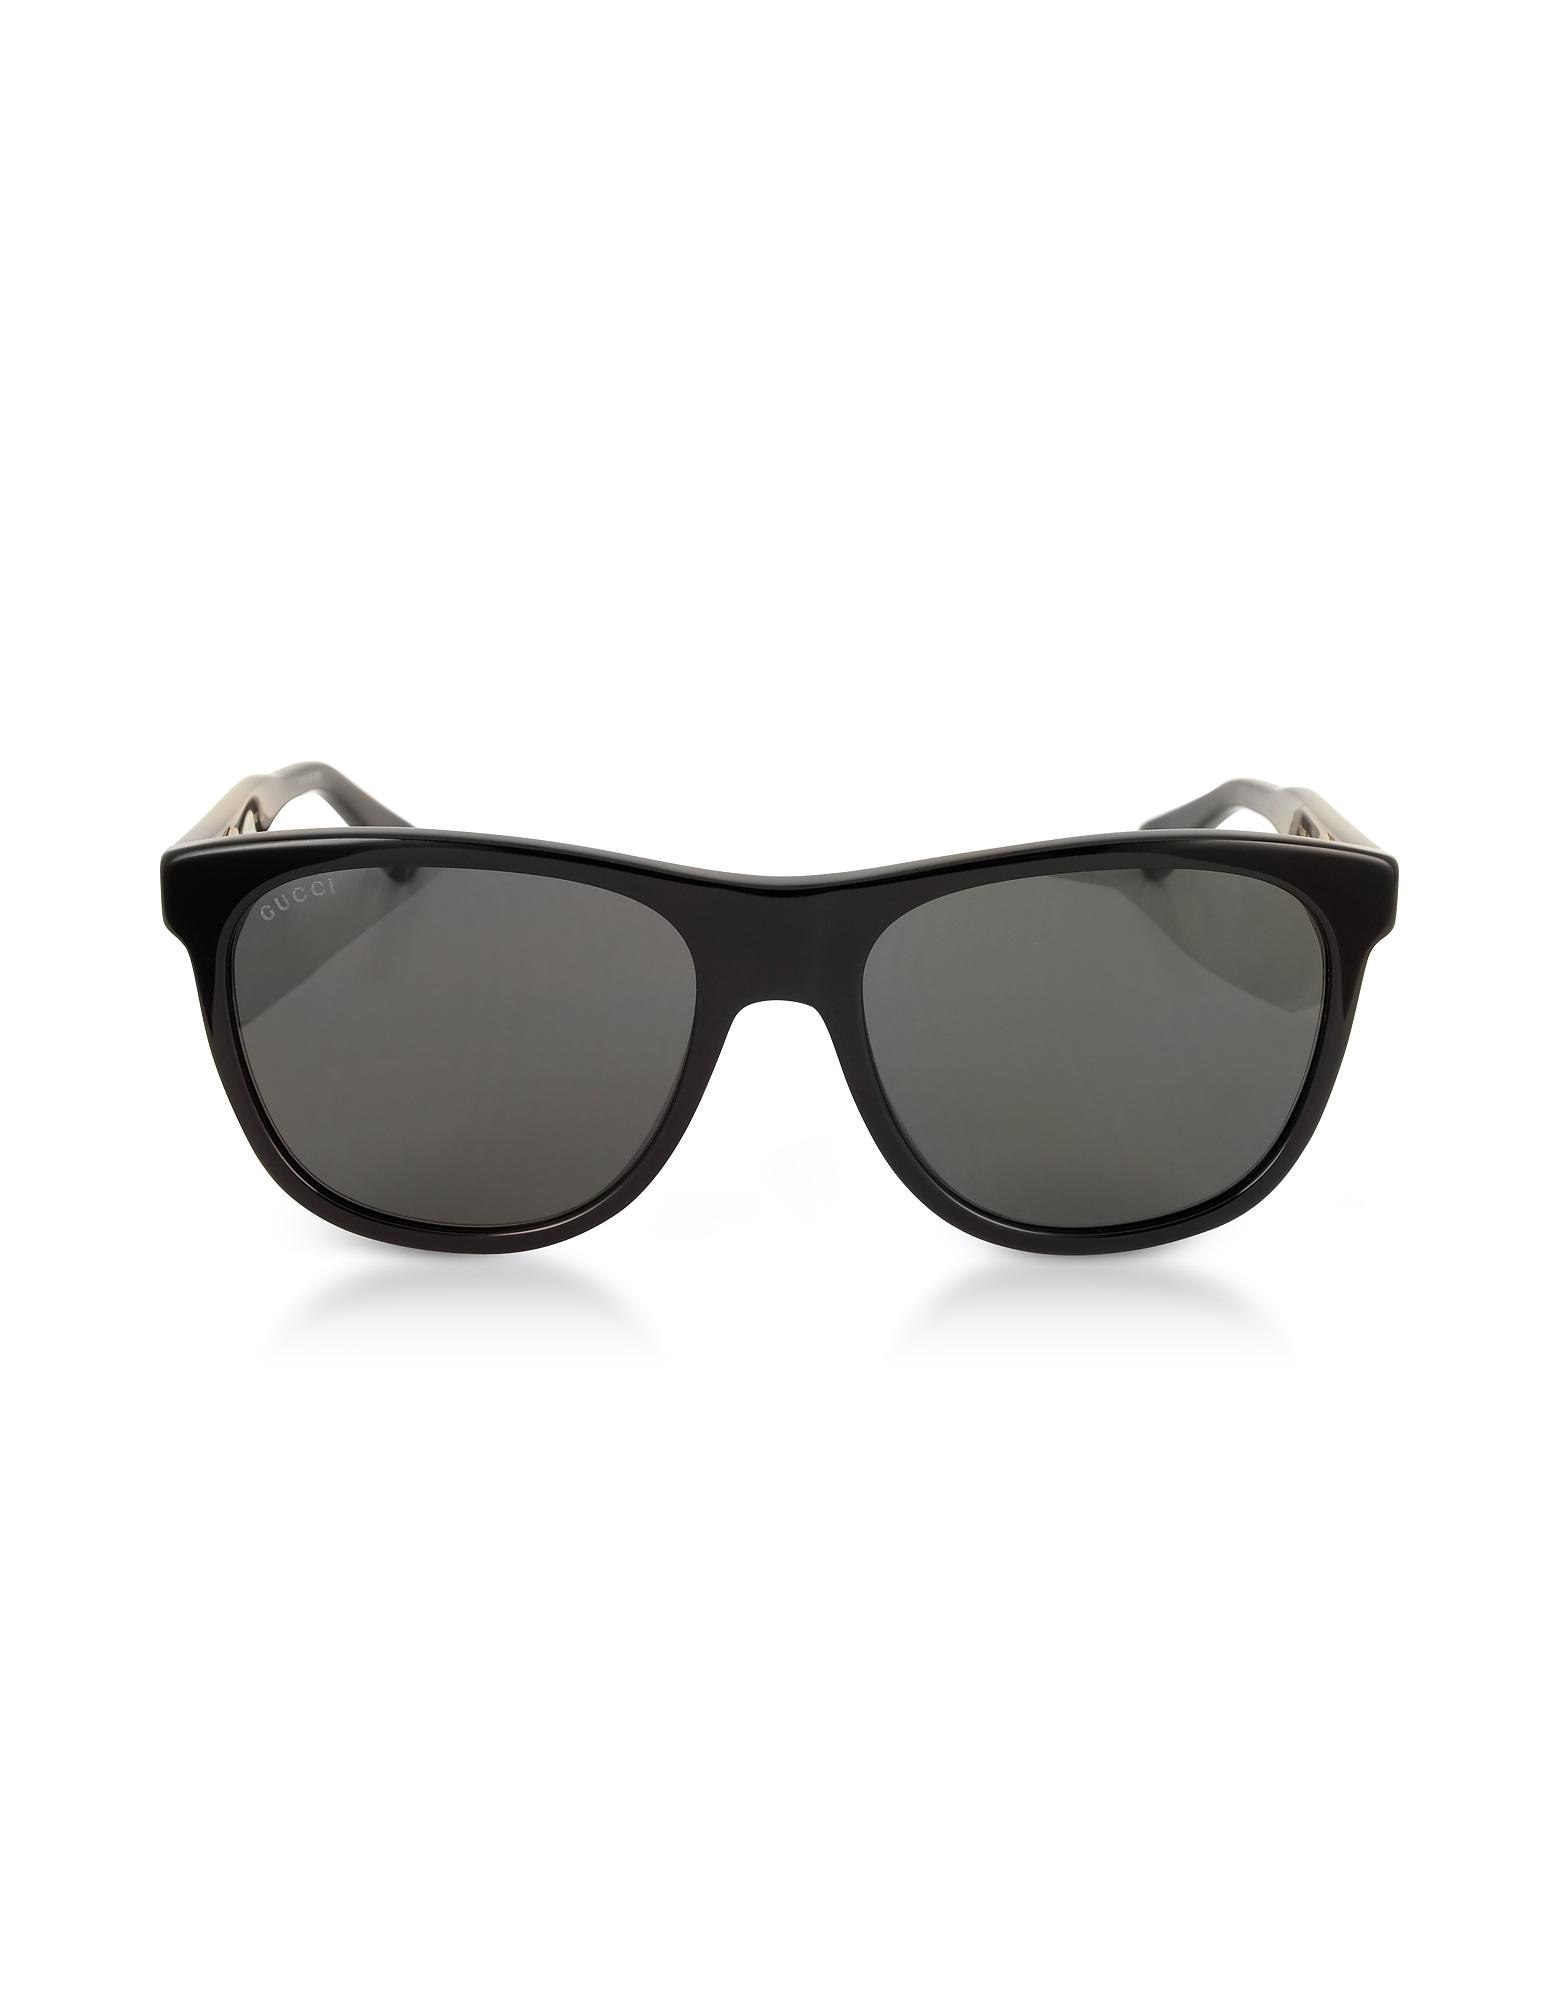 Gucci Sunglasses, GG0266S Squared-frame Black Sunglasses w/Polarized Lenses